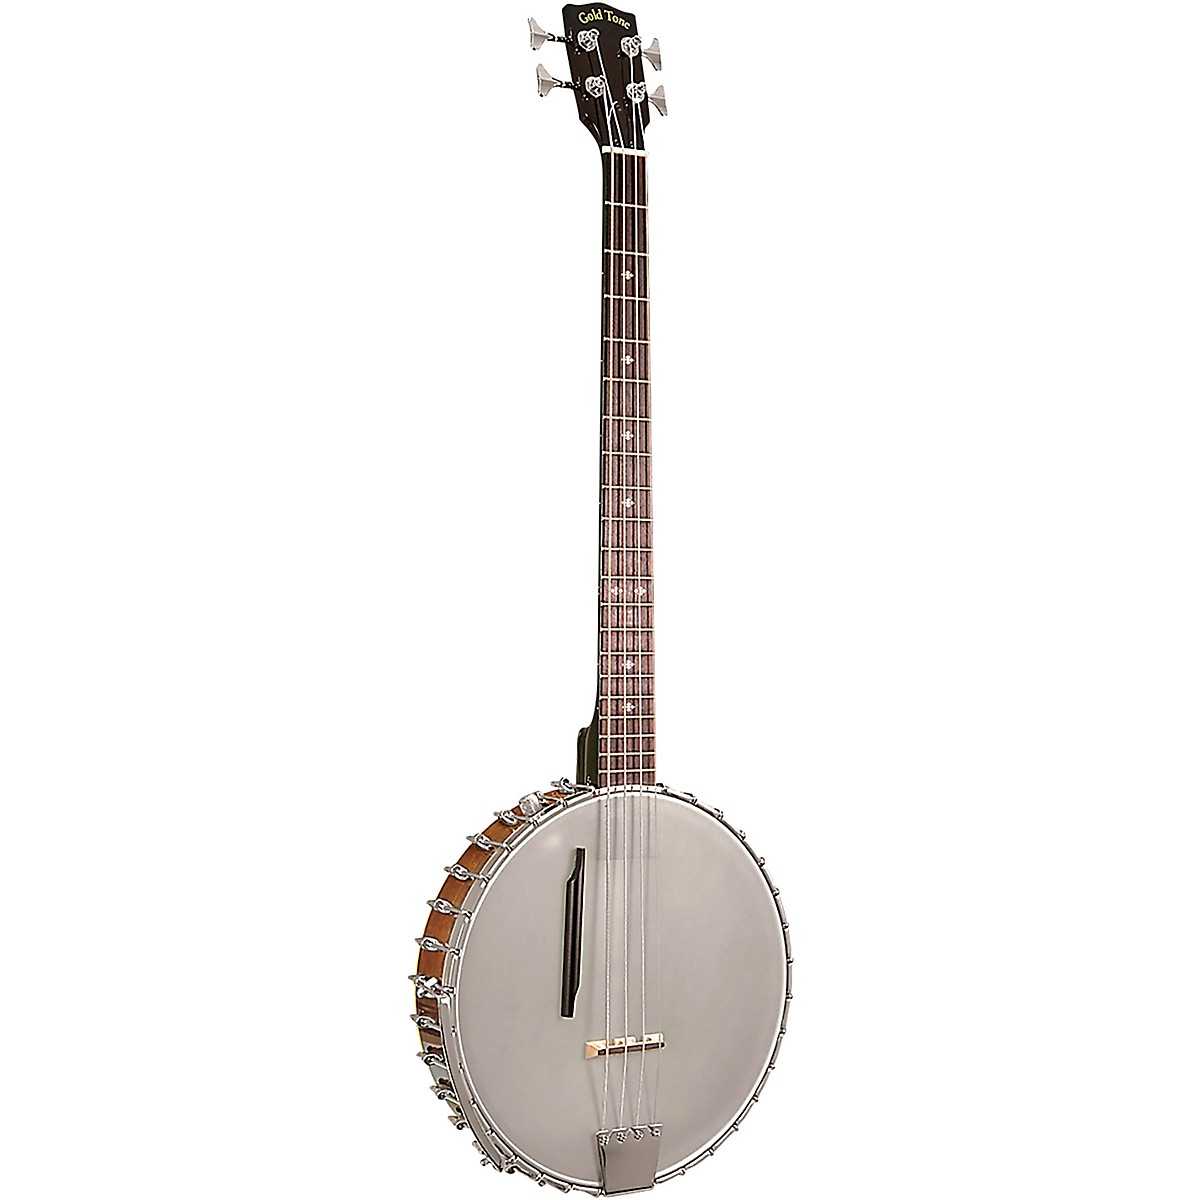 Gold Tone BB-400+ Left-Handed 4-String Banjo Bass